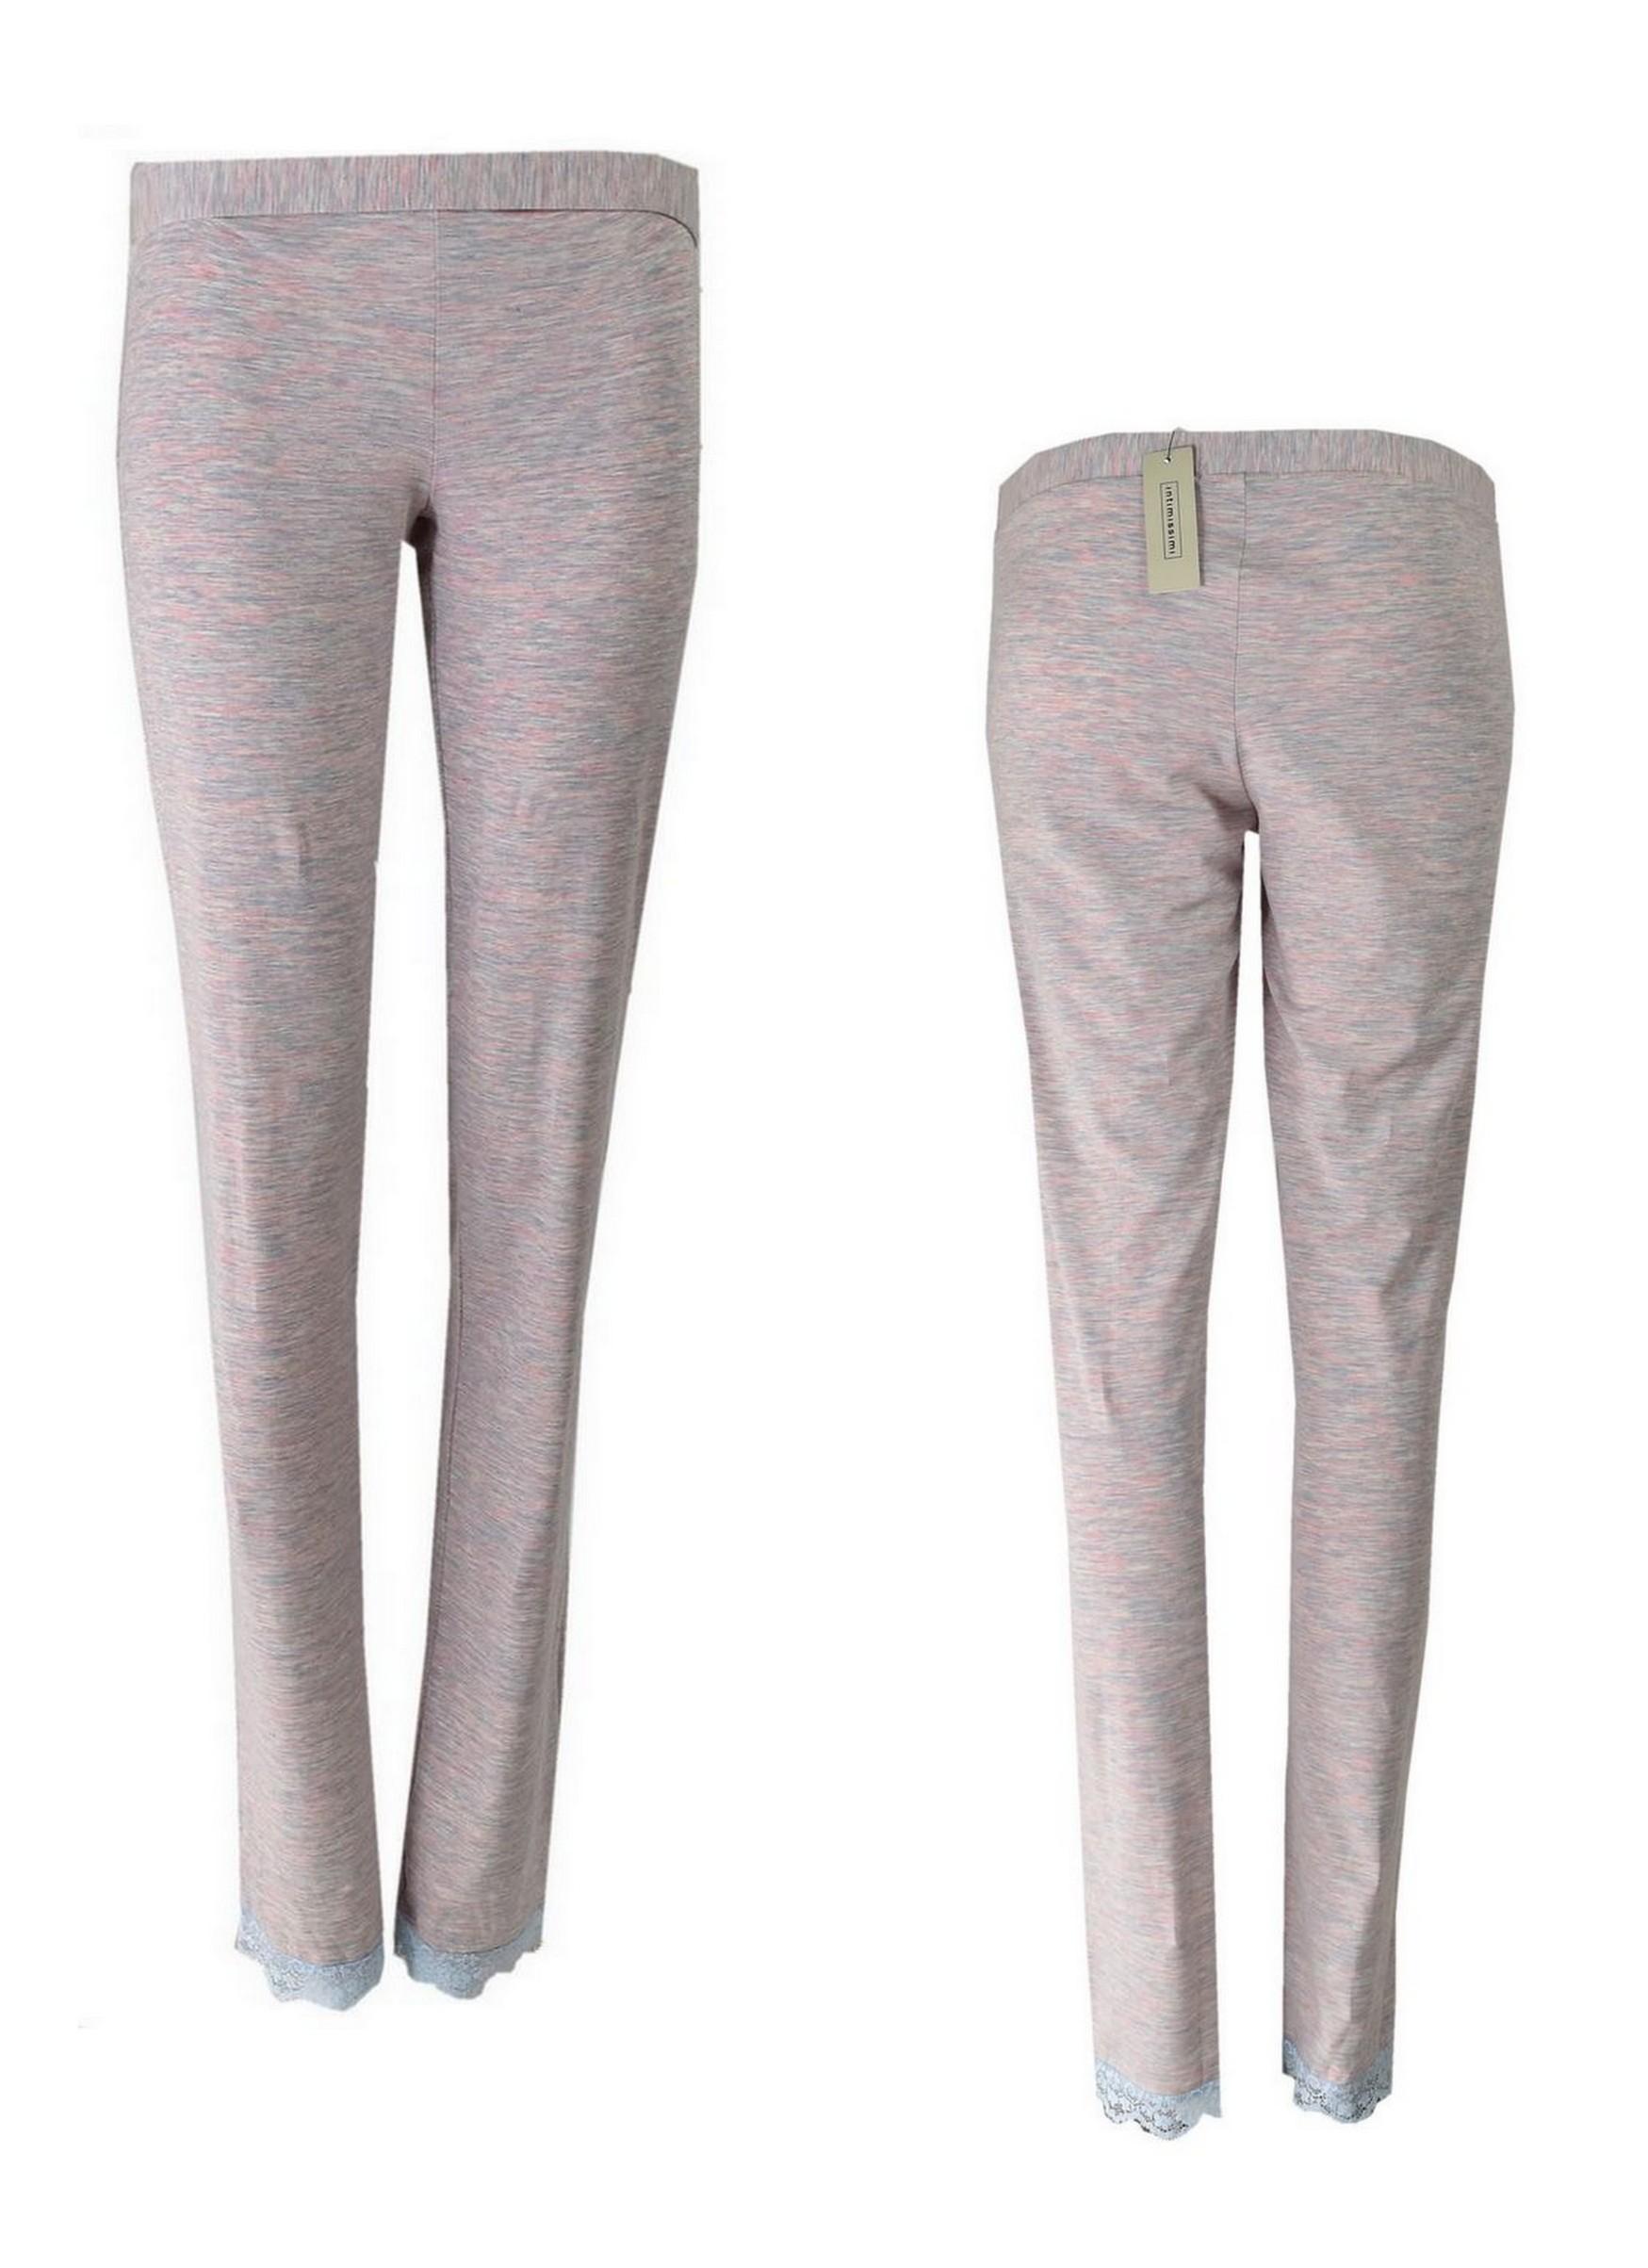 Intimissimi pyžamo nohavice retro bavlna čipky S